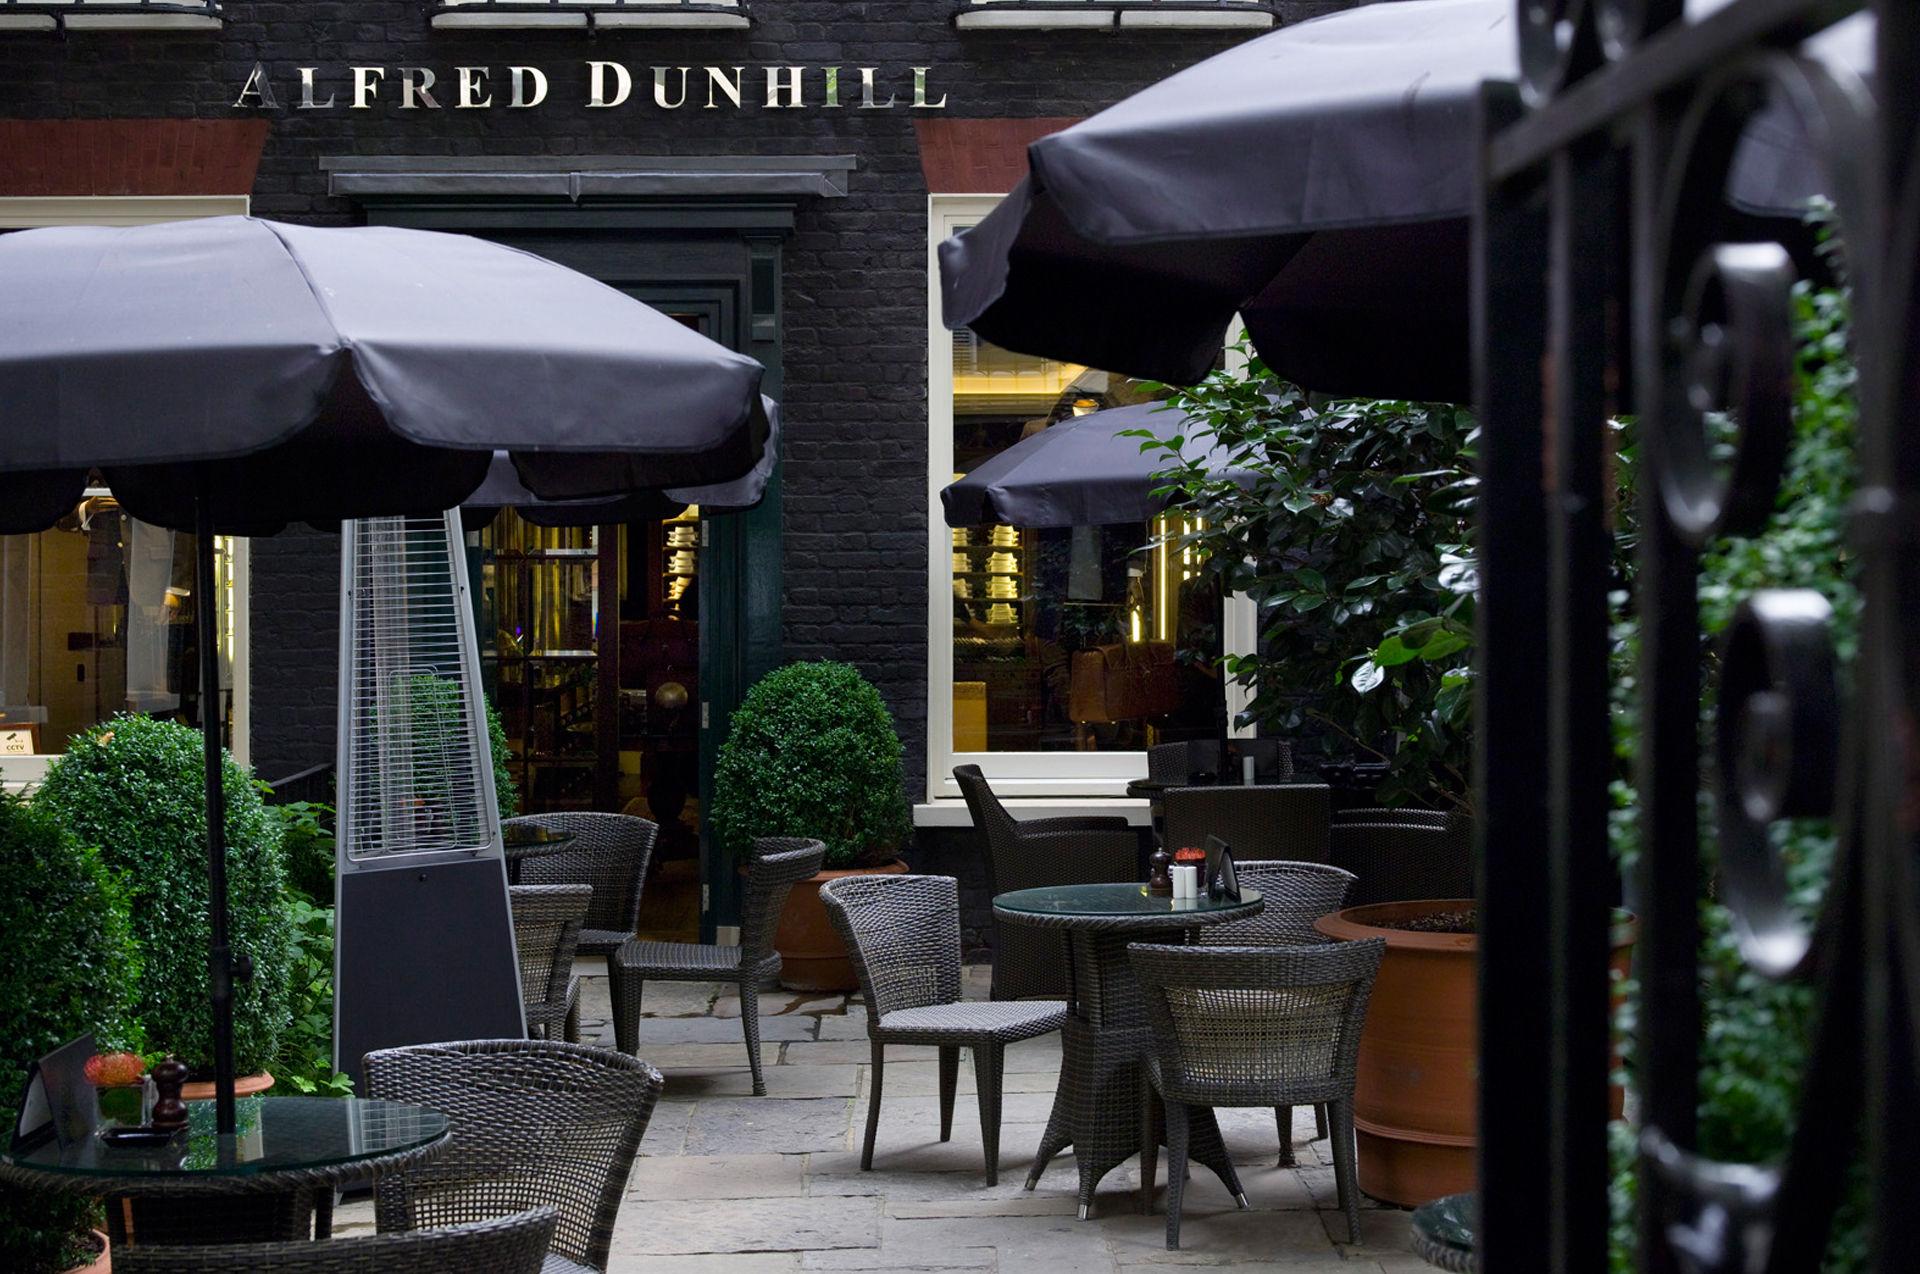 london bourdon house dunhill online store. Black Bedroom Furniture Sets. Home Design Ideas